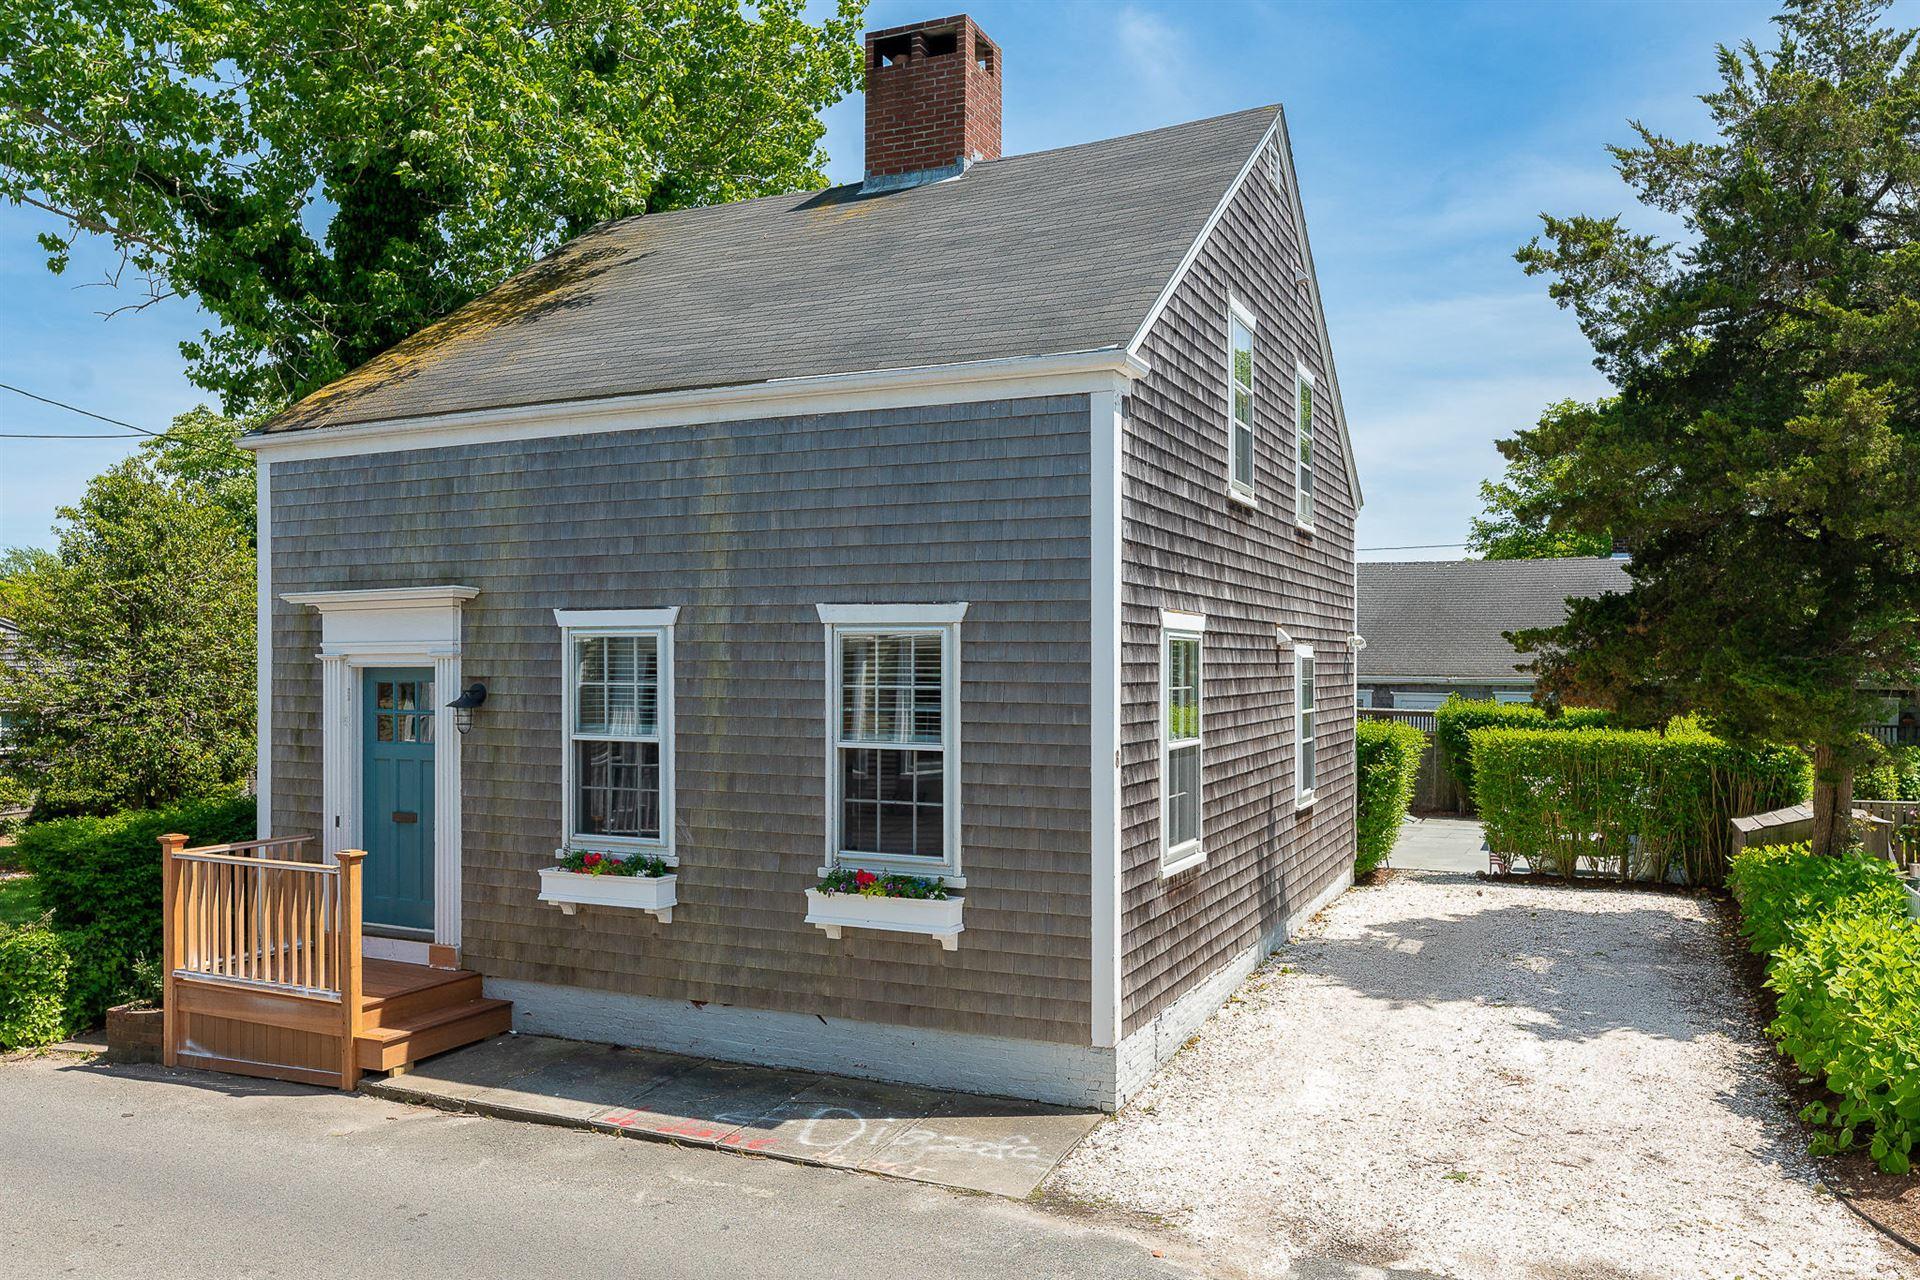 Photo of 8 E Dover Street, Nantucket, MA 02554 (MLS # 22103155)